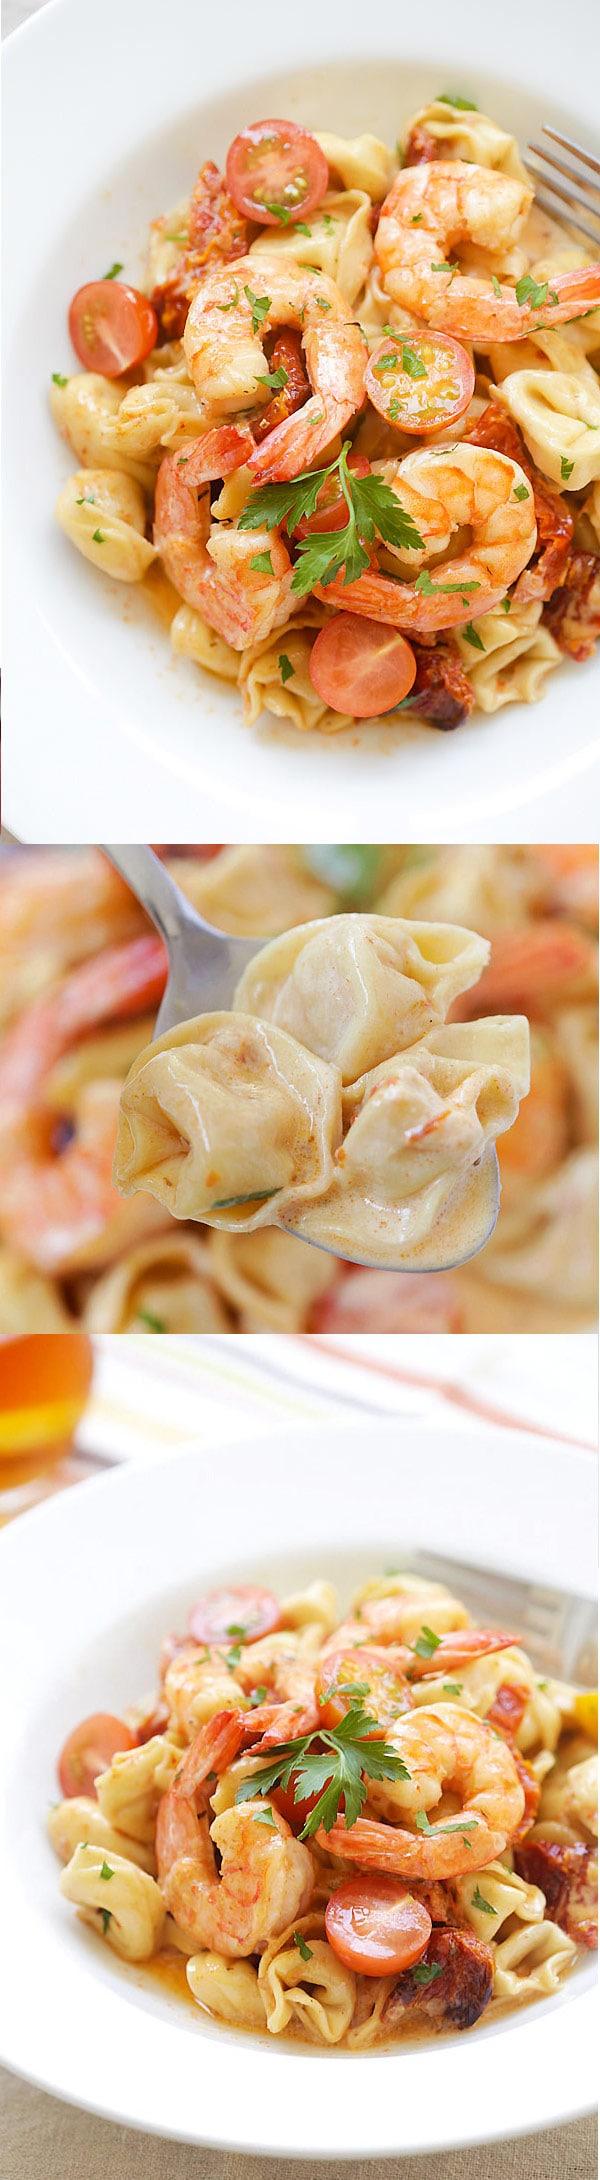 Amazing recipe for homemade Shrimp & Sun-Dried Tomato Tortellini. Budget-friendly and tastes better than any Italian restaurant's! | rasamalaysia.com